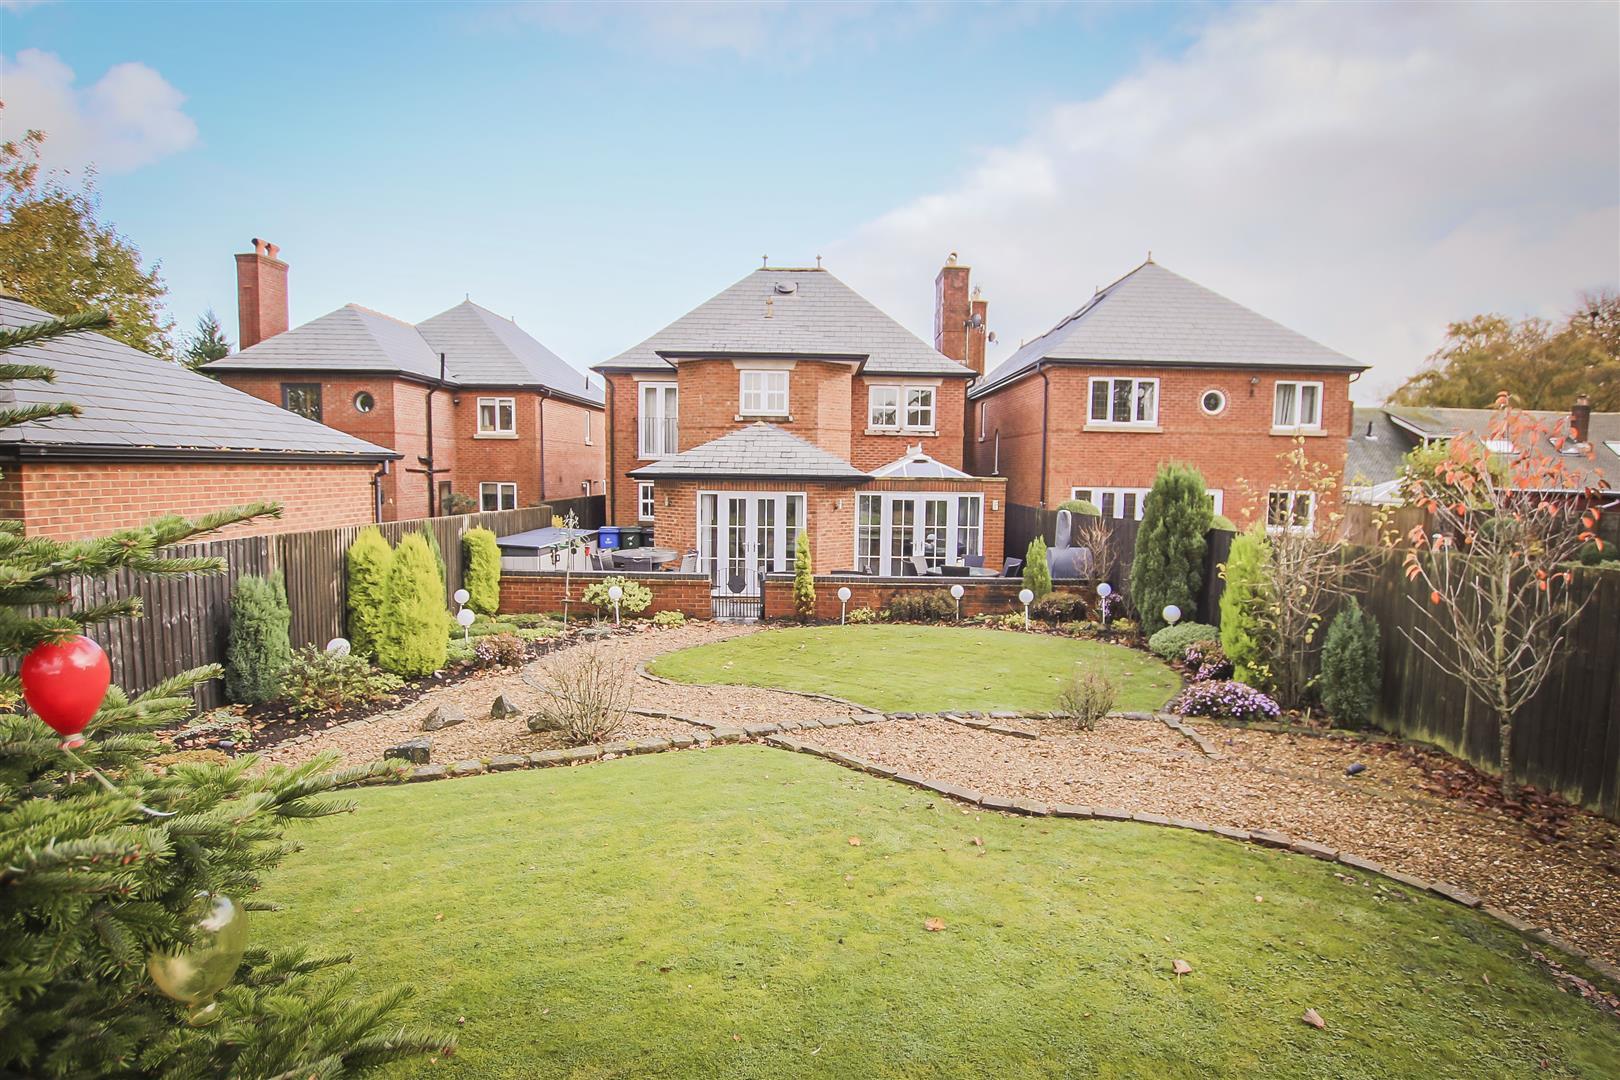 4 Bedroom Detached House For Sale - Rear Garden